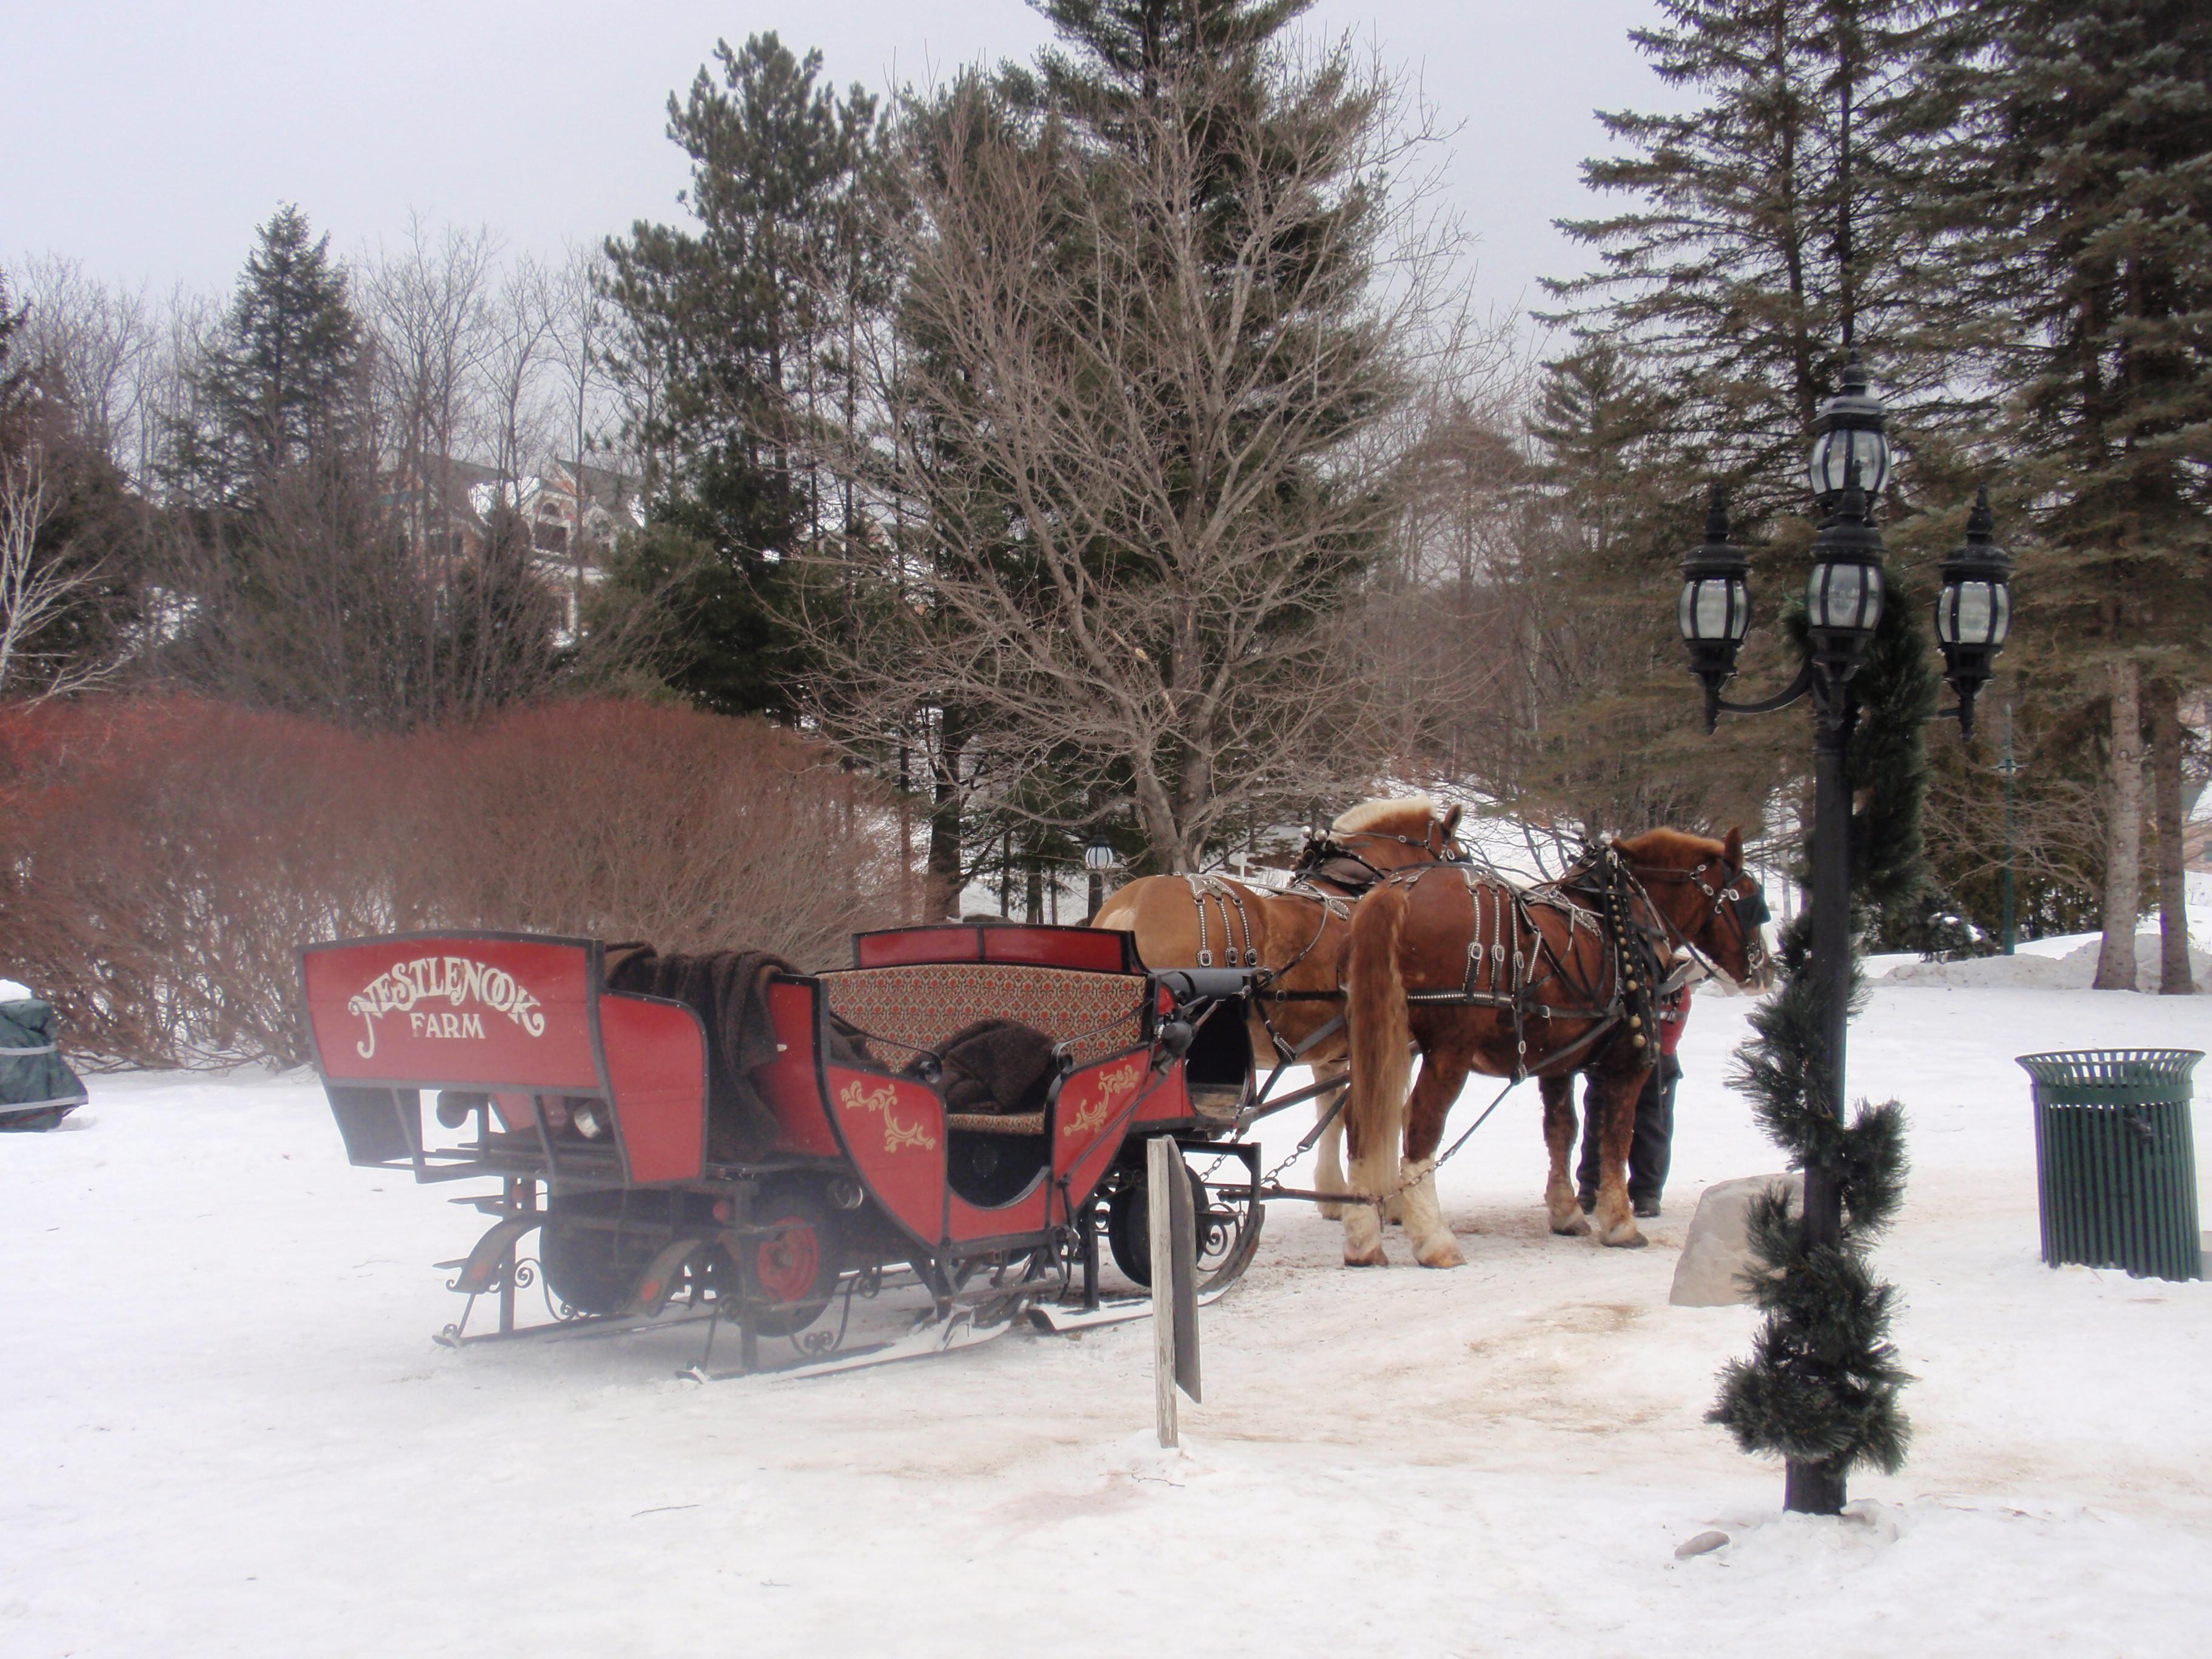 Ice skating and sleigh rides at Nestlenook Farms